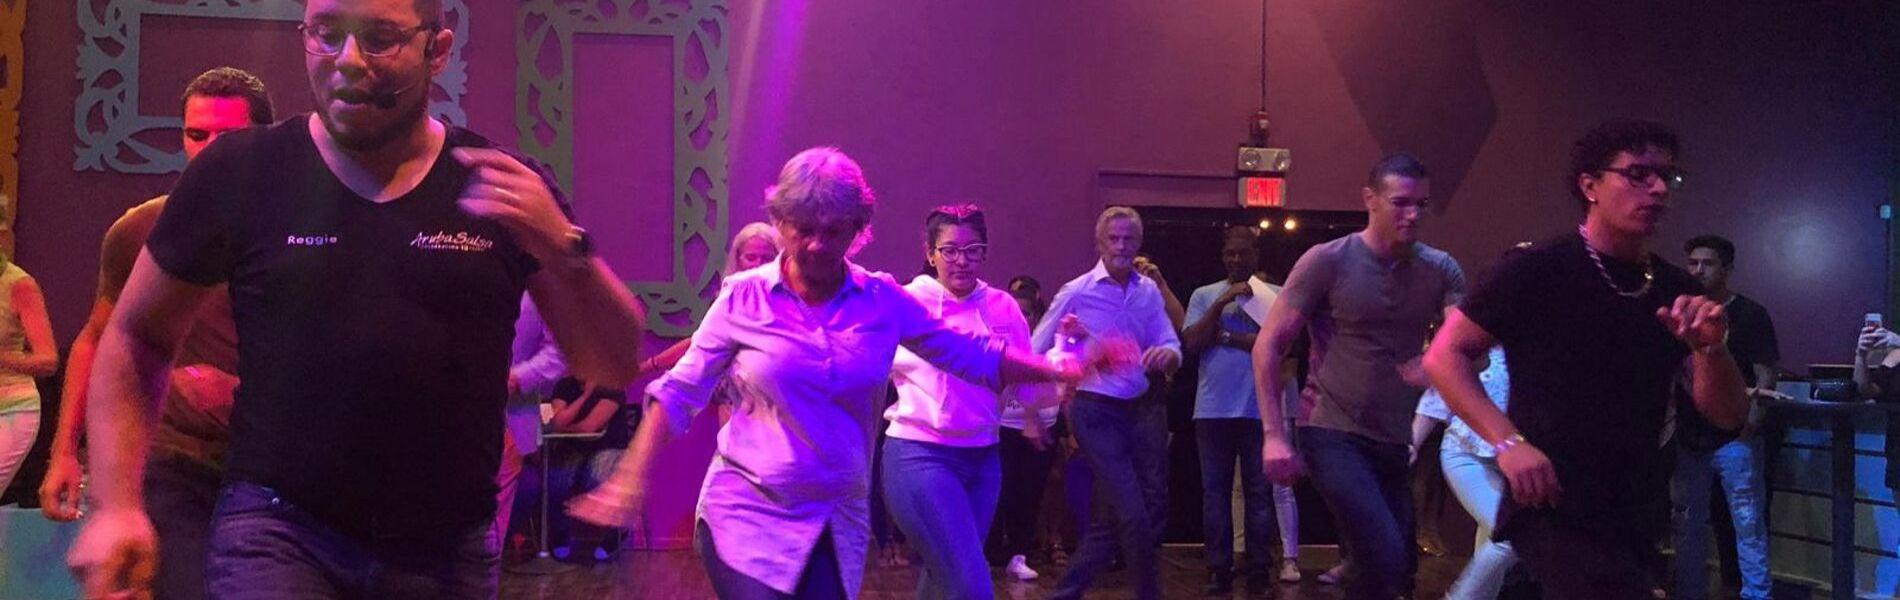 Salsa Leren Dansen op Aruba is Fun!